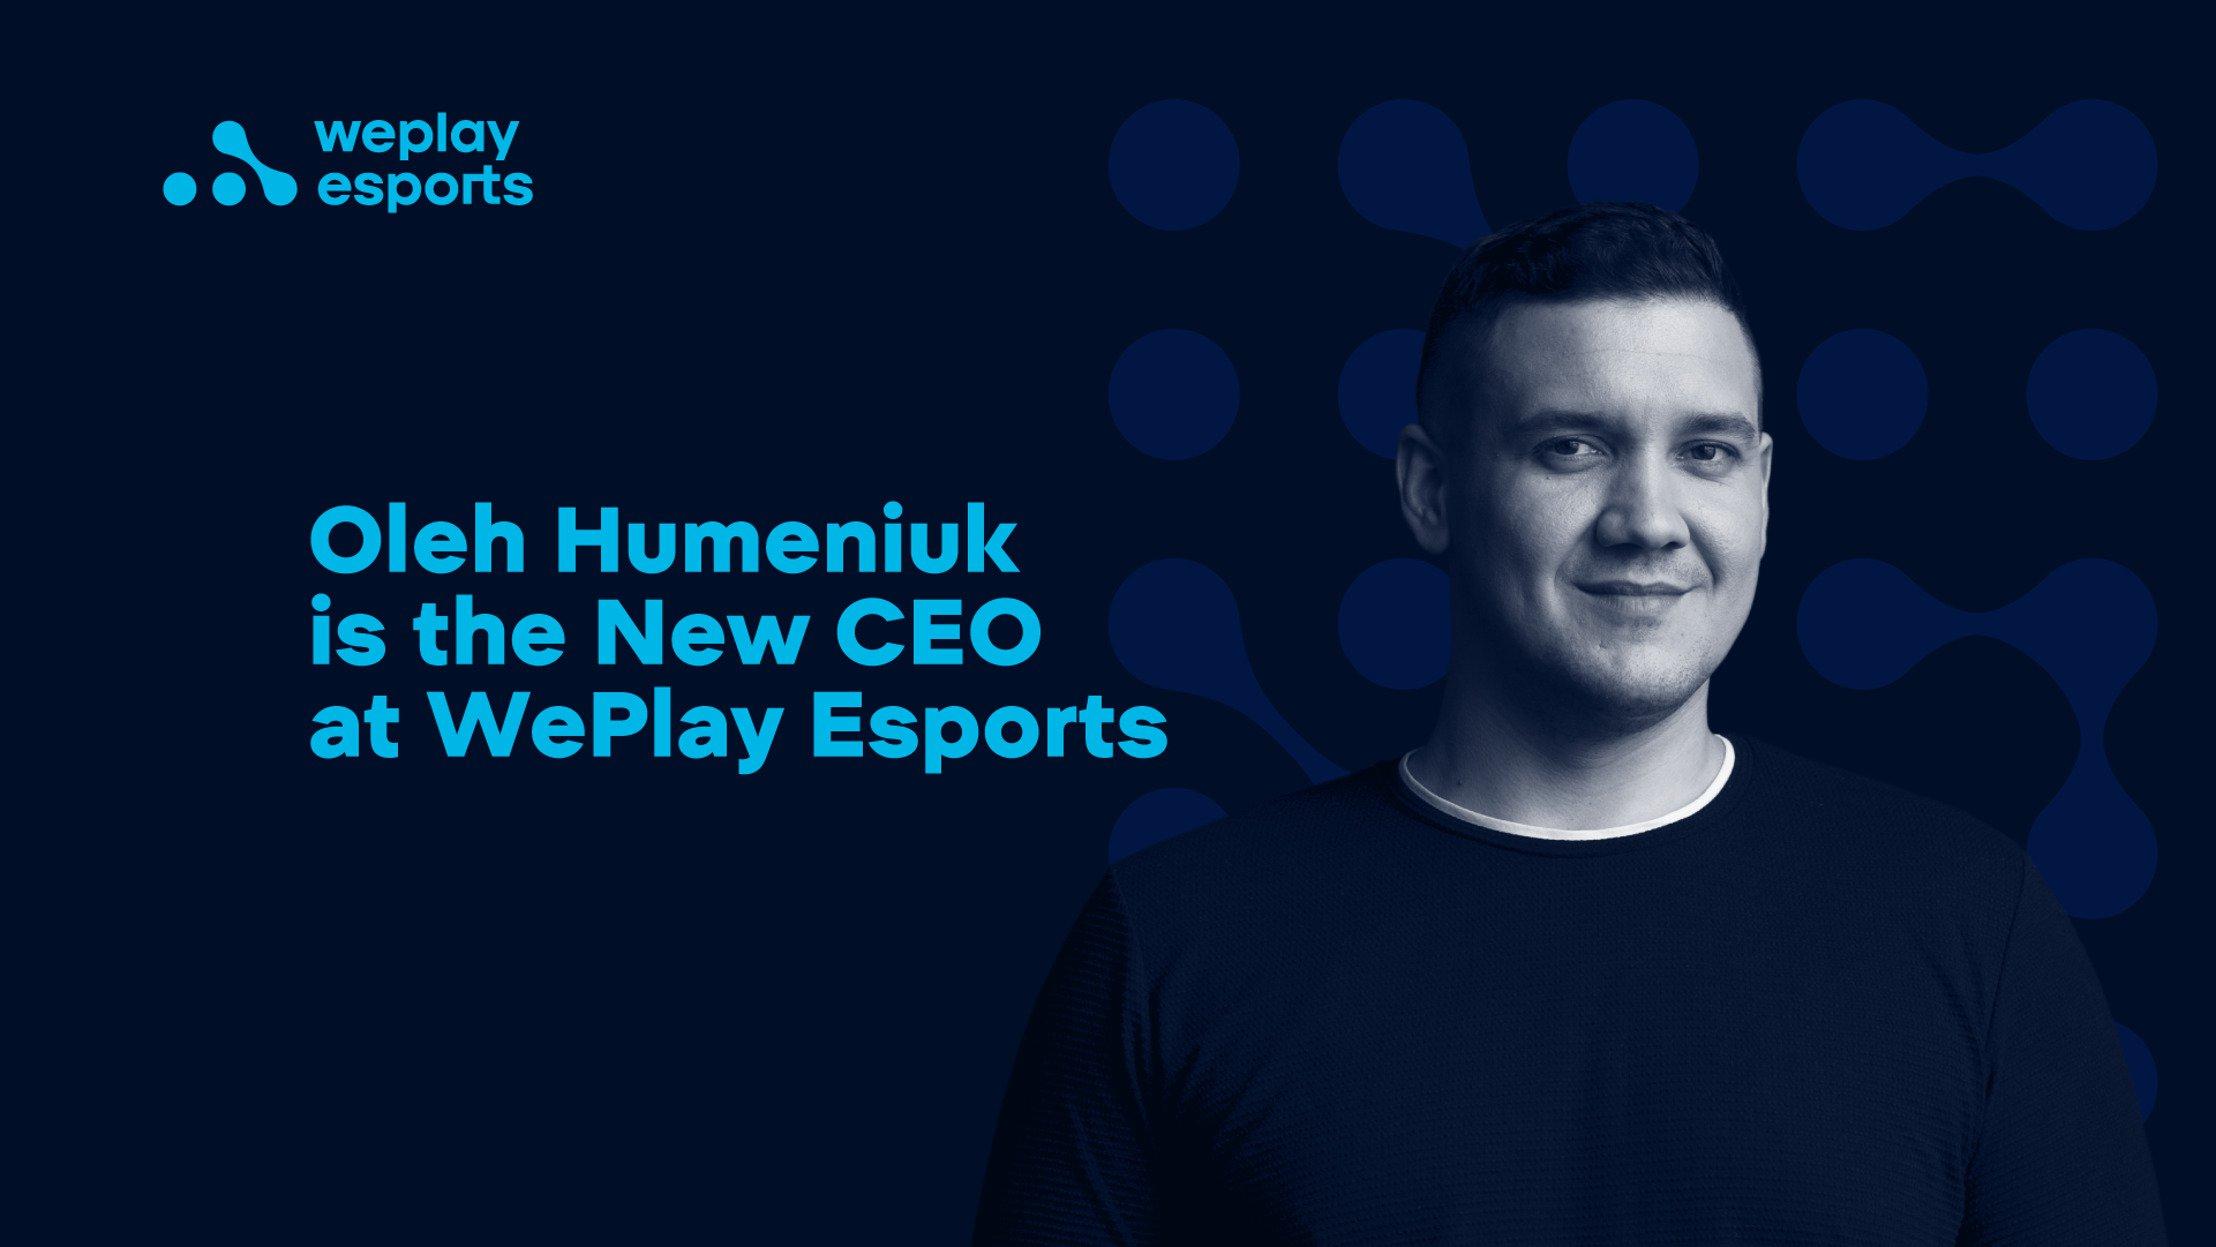 WePlay Esports names a new CEO, Oleh Humeniuk